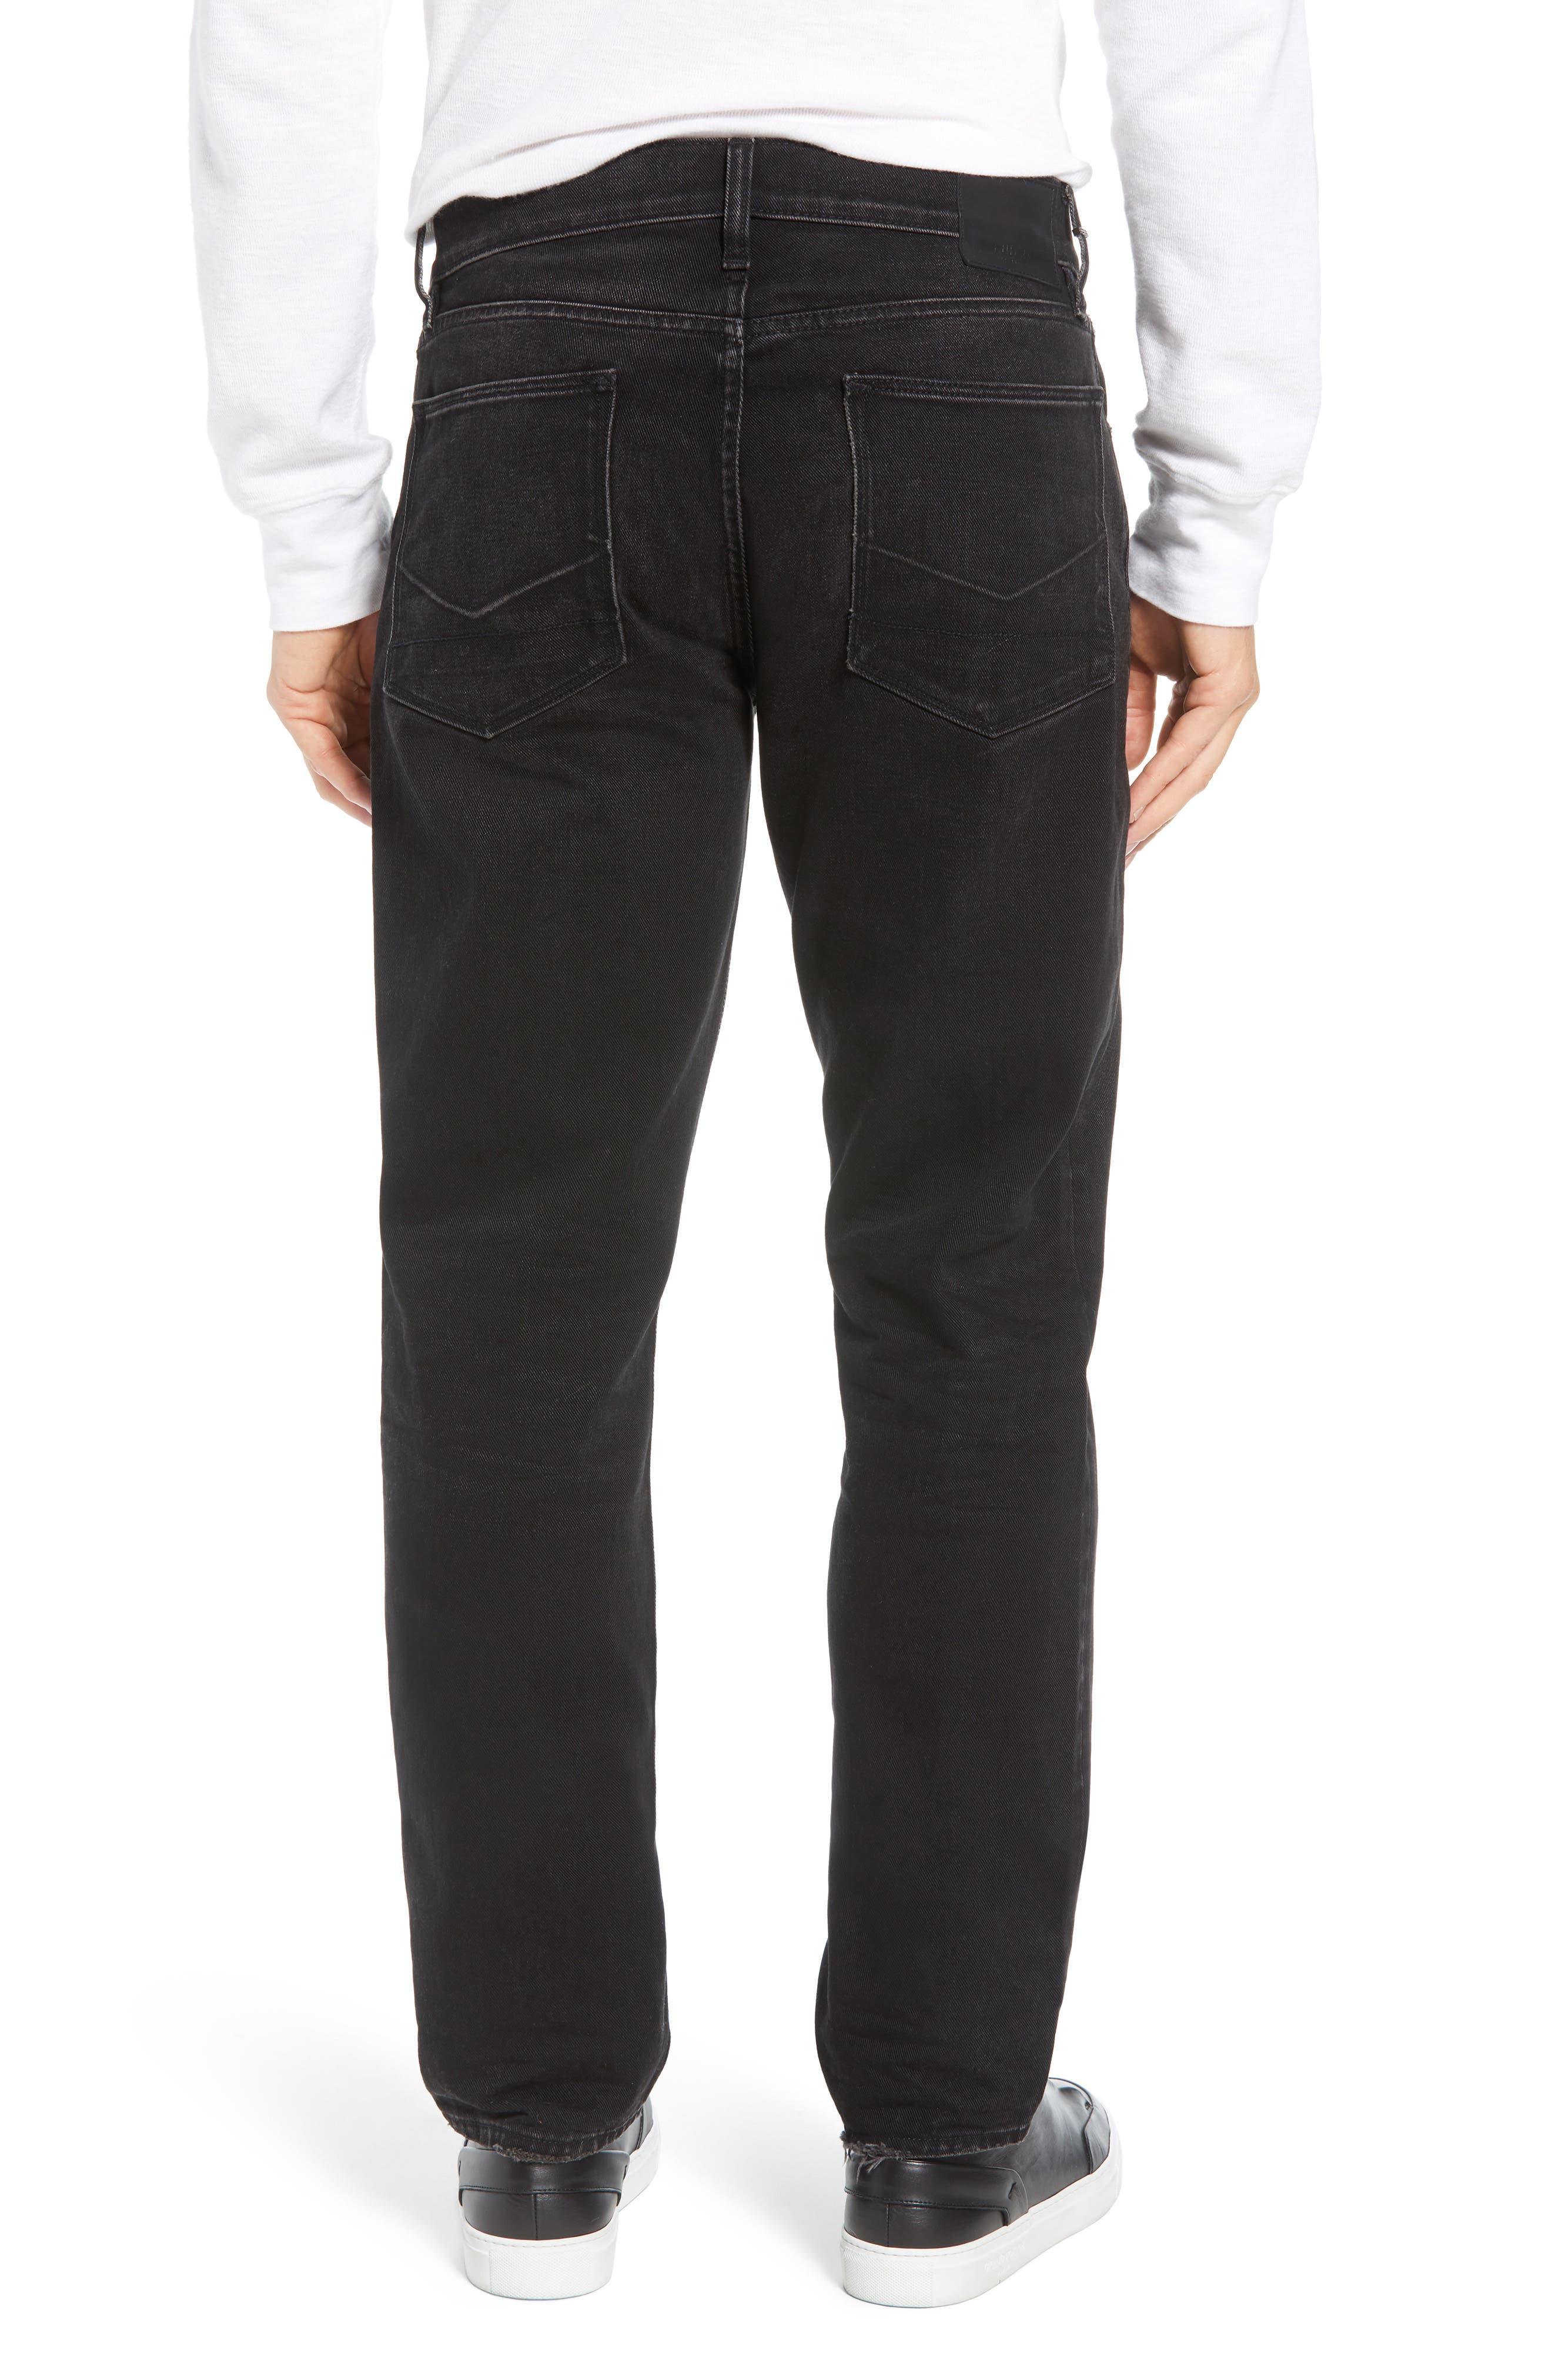 Dillon Straight Leg Jeans,                             Alternate thumbnail 2, color,                             001